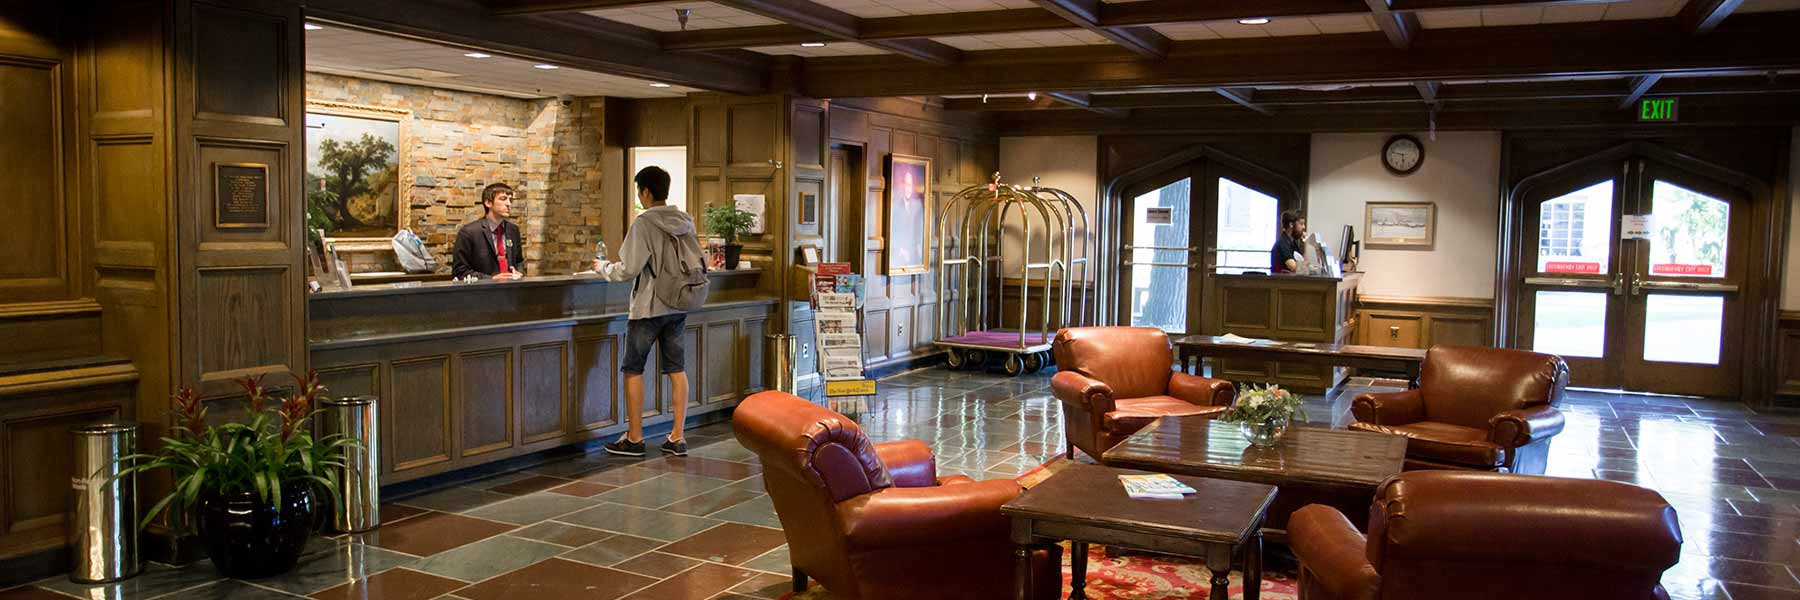 Biddle Hotel Indiana Memorial Union Indiana University Bloomington